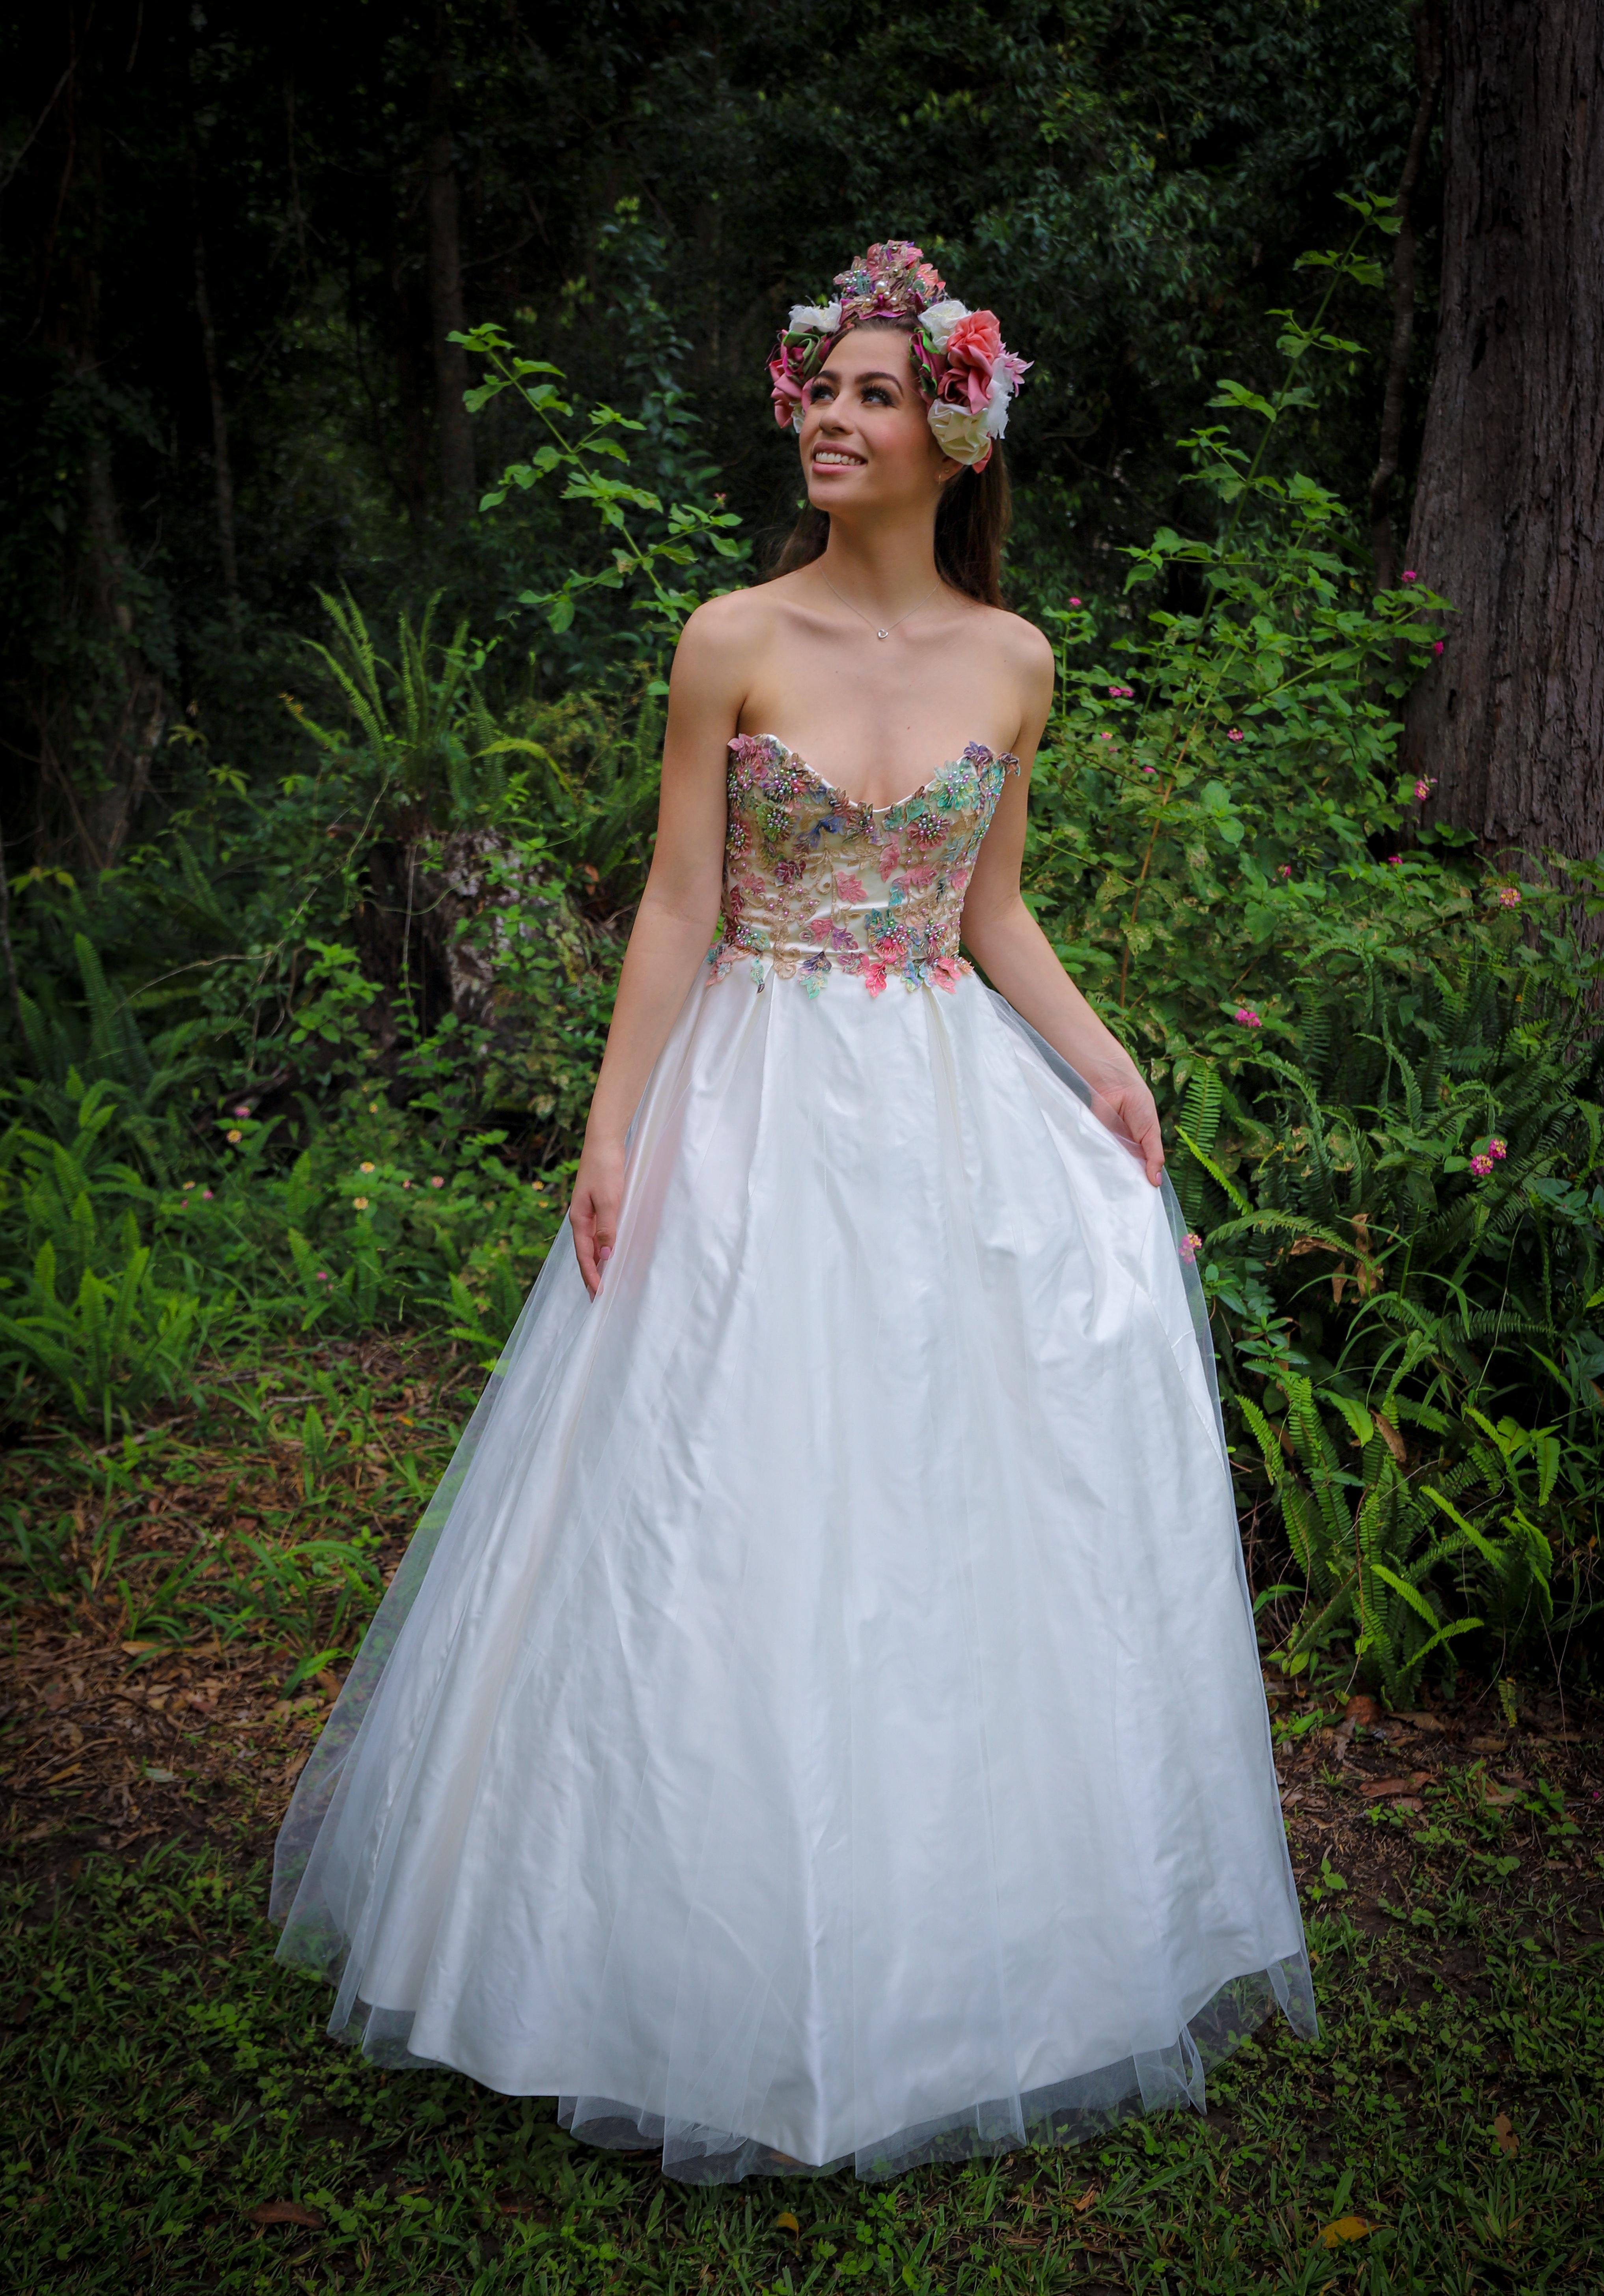 preloved wedding dresses gold coast